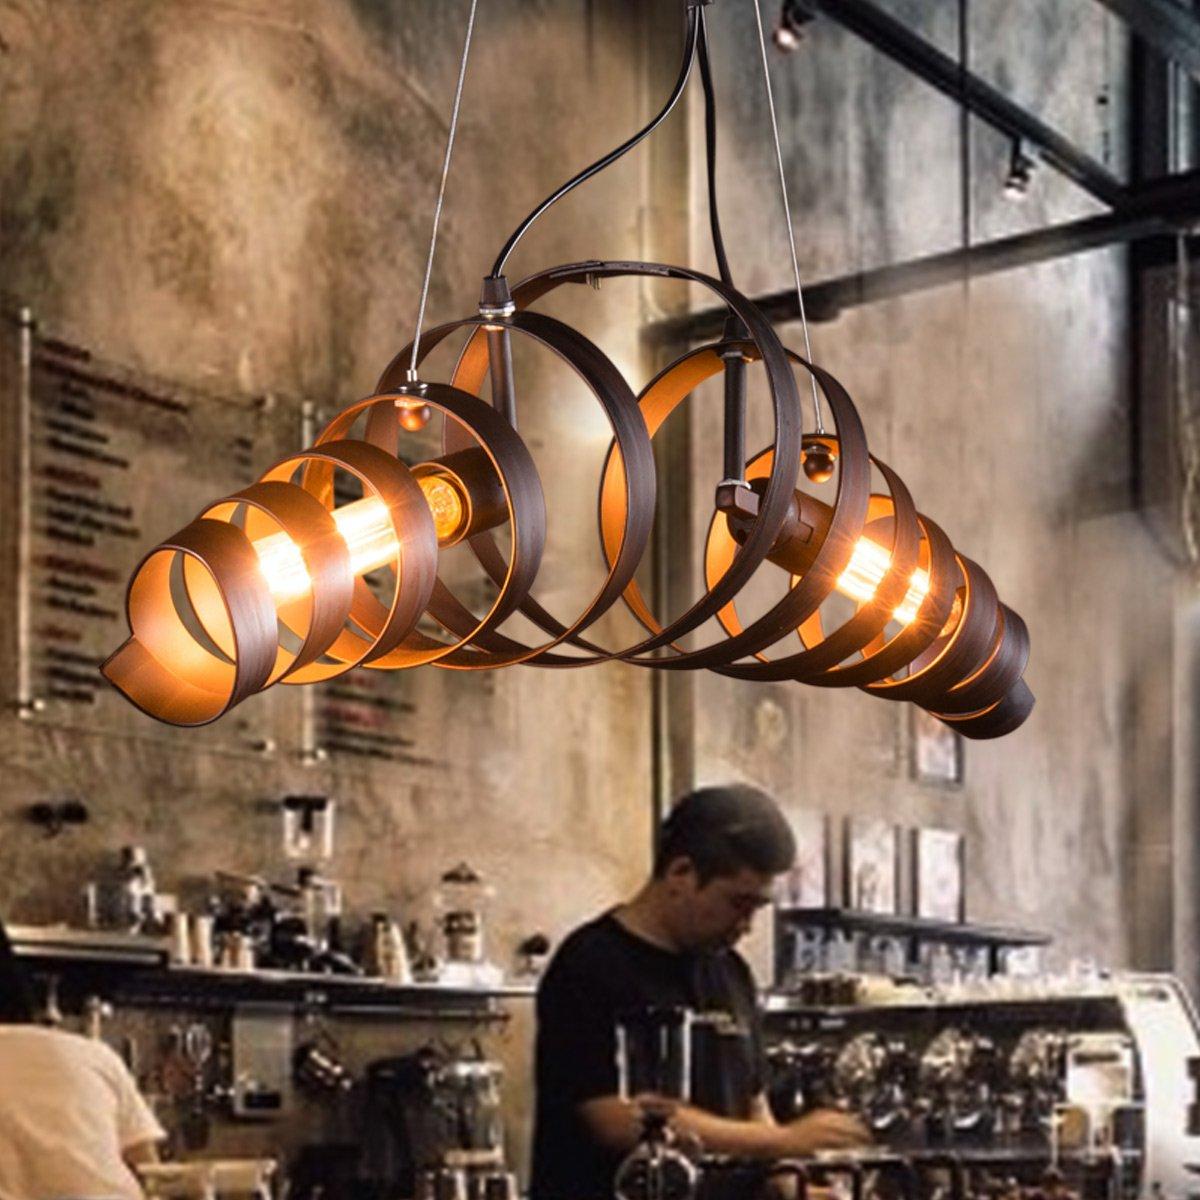 KJLARS Retro Pendelleuchte Vintage Kronleuchter Spiralelampe Hängelampe Pendellampe lampeleuchte Eisen-Lampe Eisen-Lampe Eisen-Lampe Industrielampe Hängeleuchte de3e31